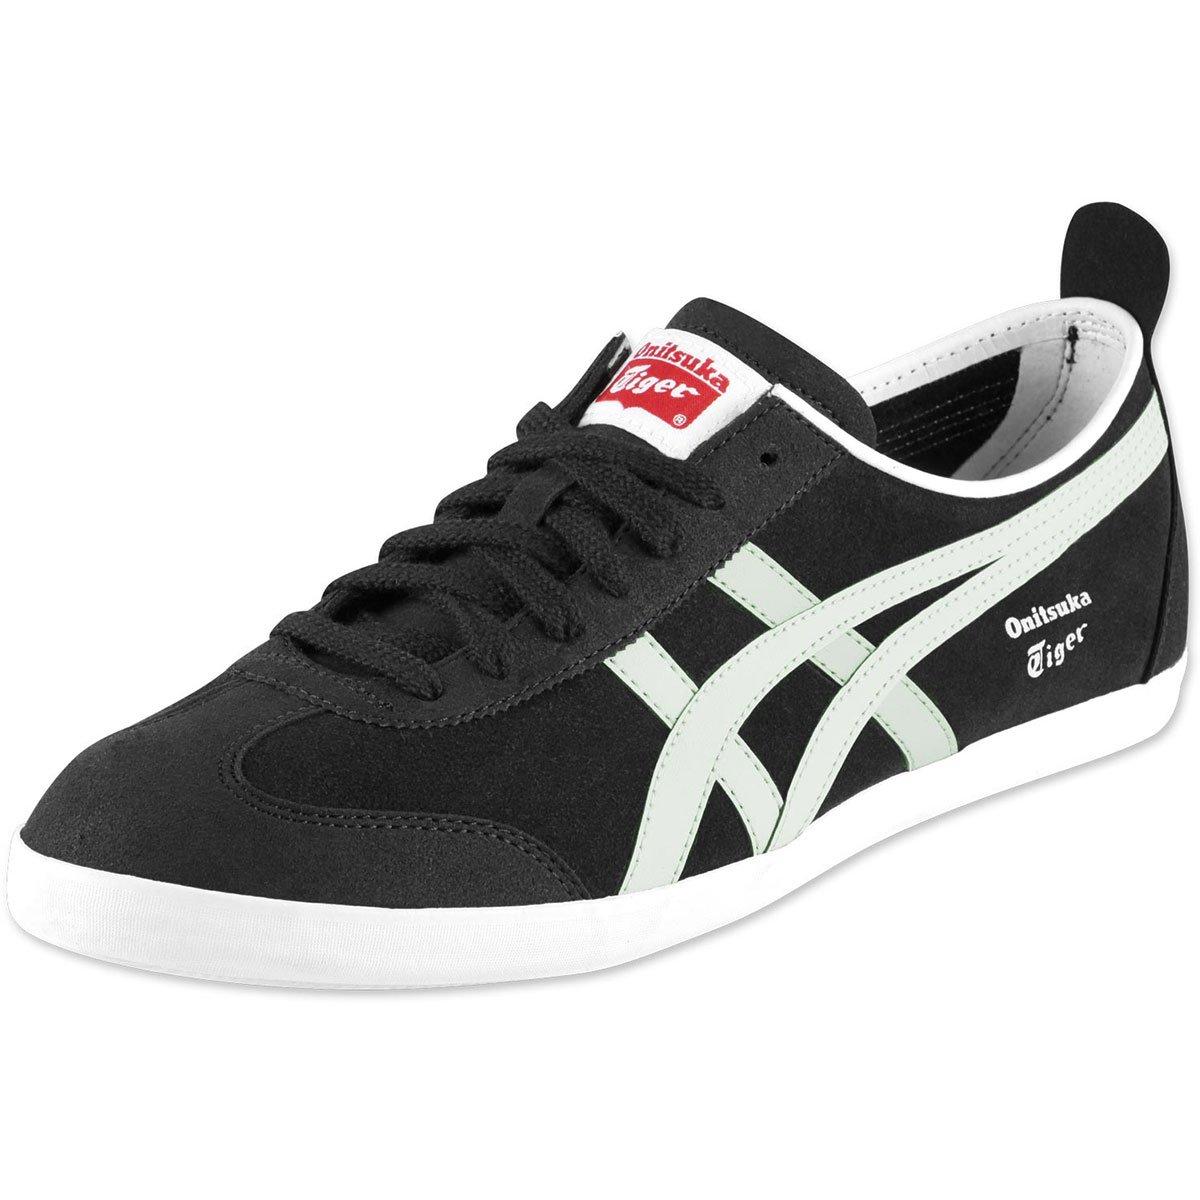 chaussures de sport 6e051 c1ecb Buty ONITSUKA TIGER Mexico 66 (ASICS)